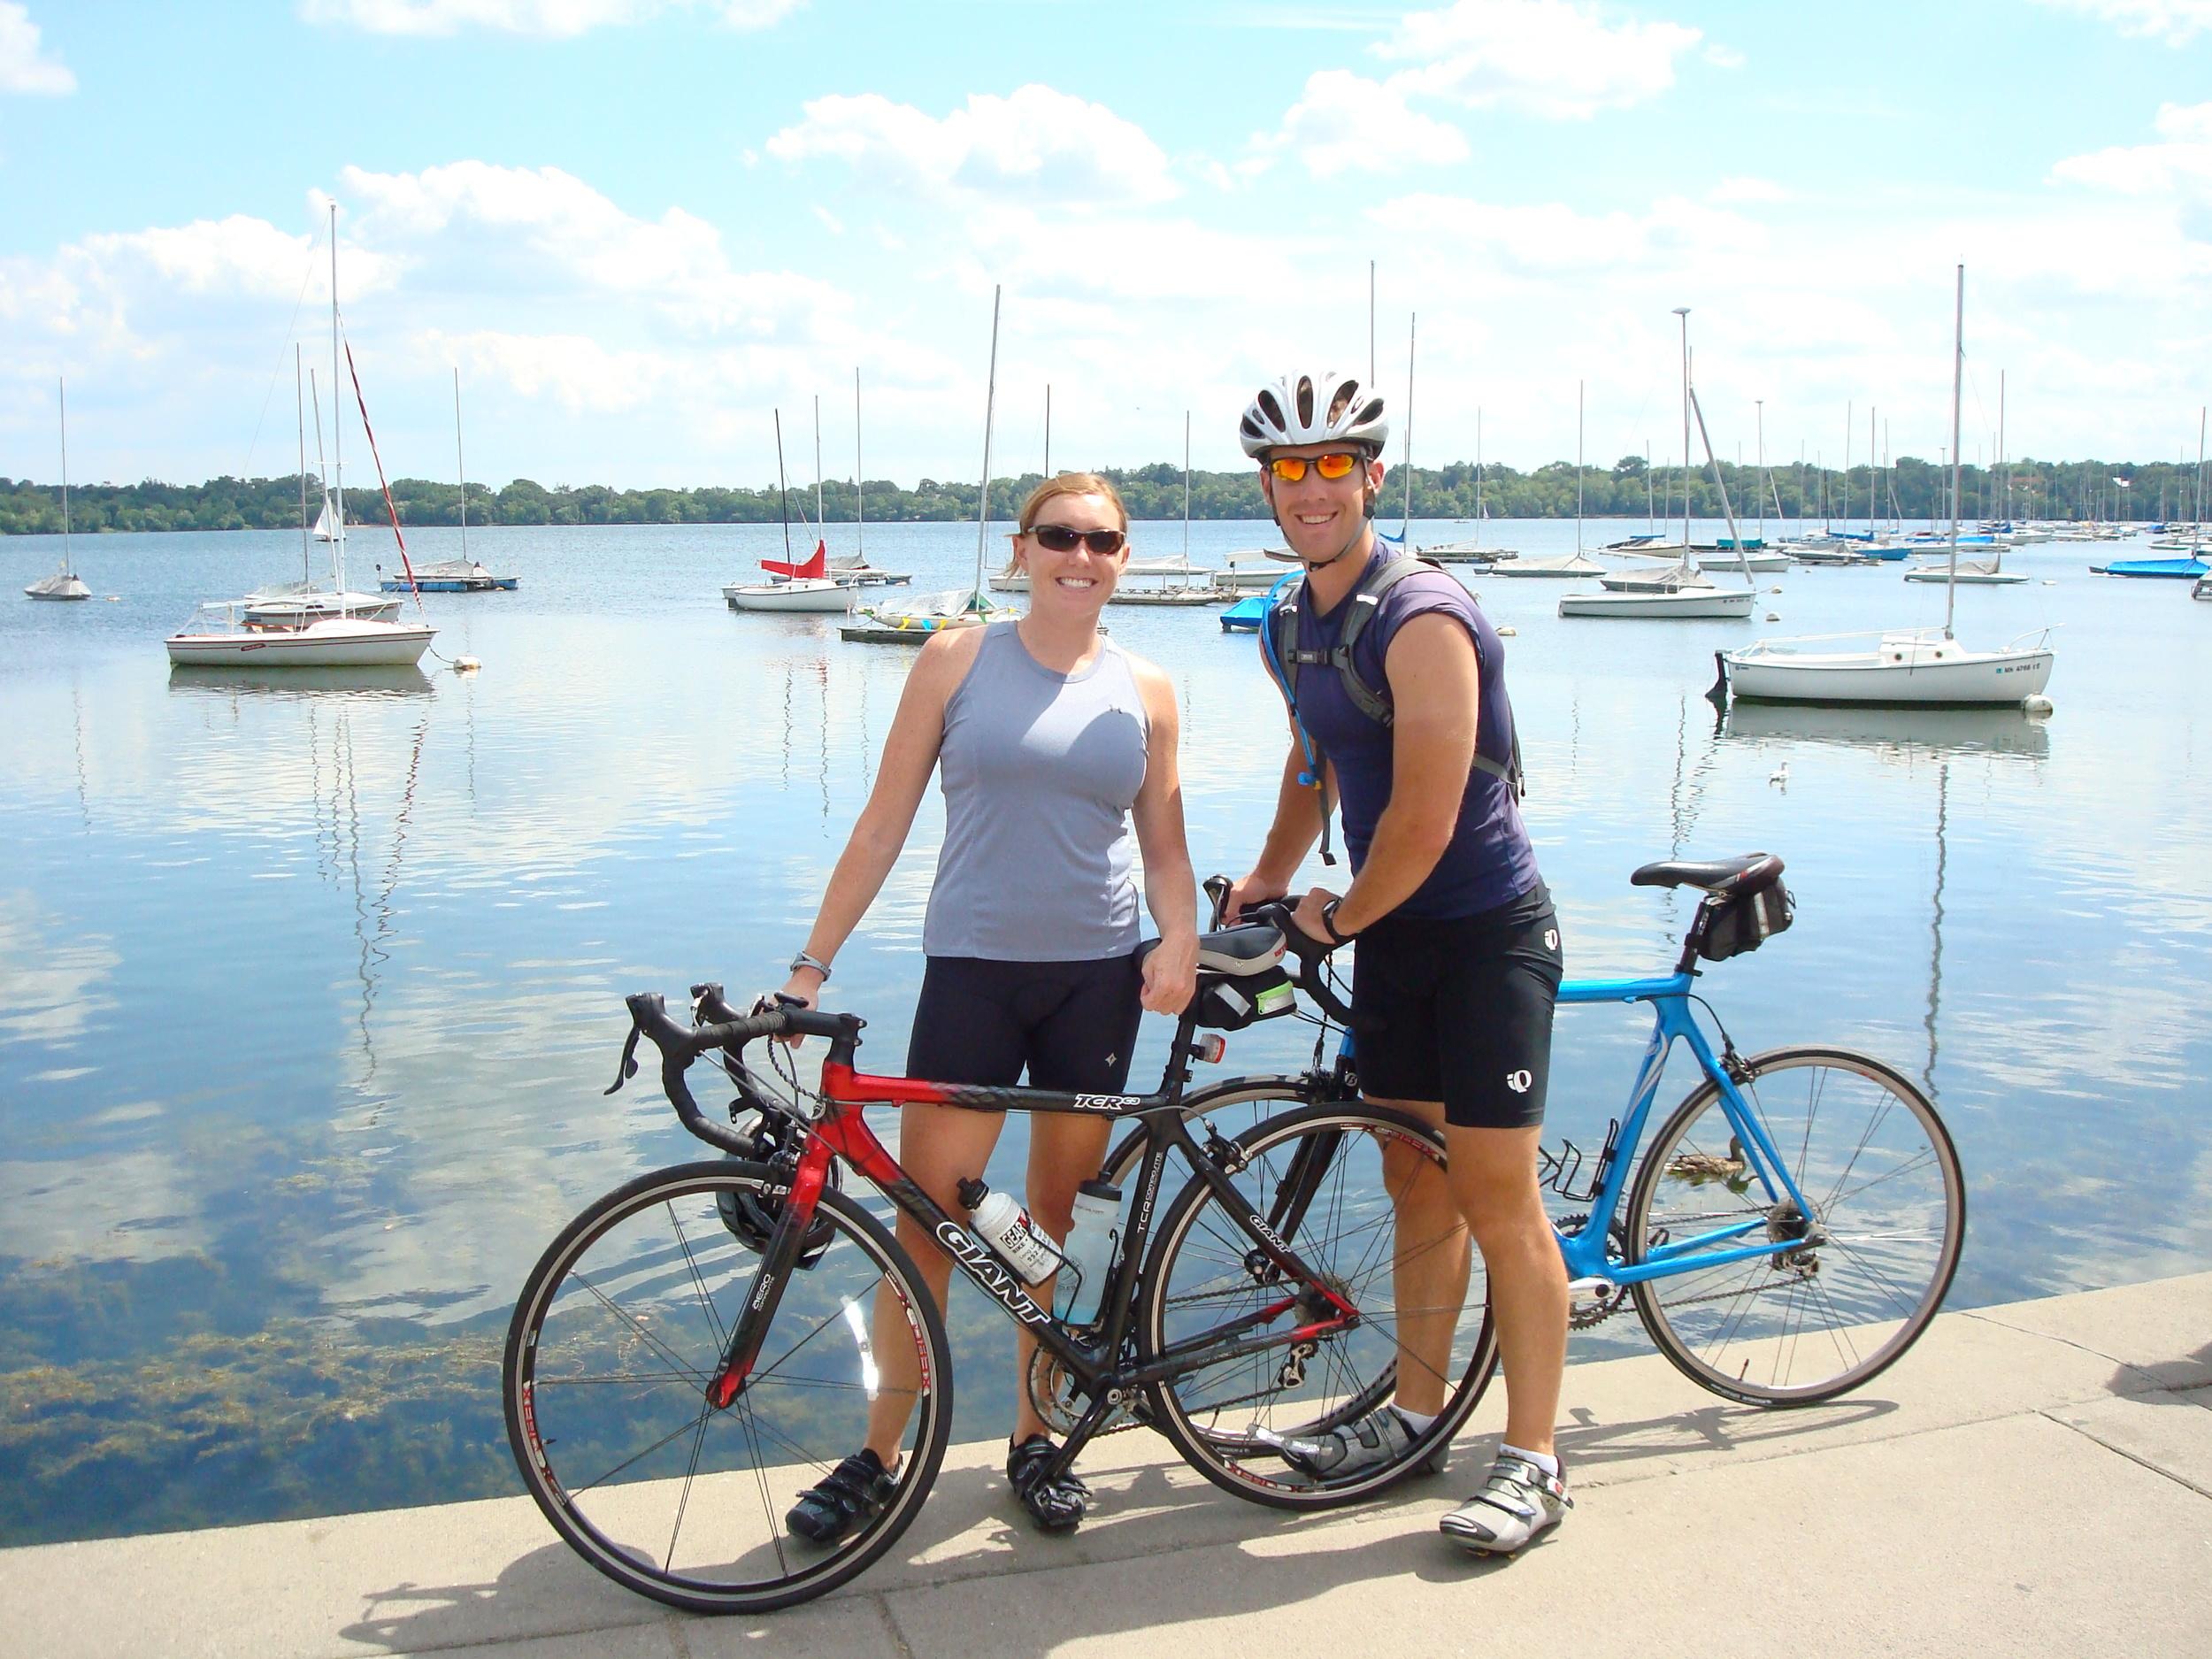 Todd_&_Kath_biking_Minneapolis_.JPG